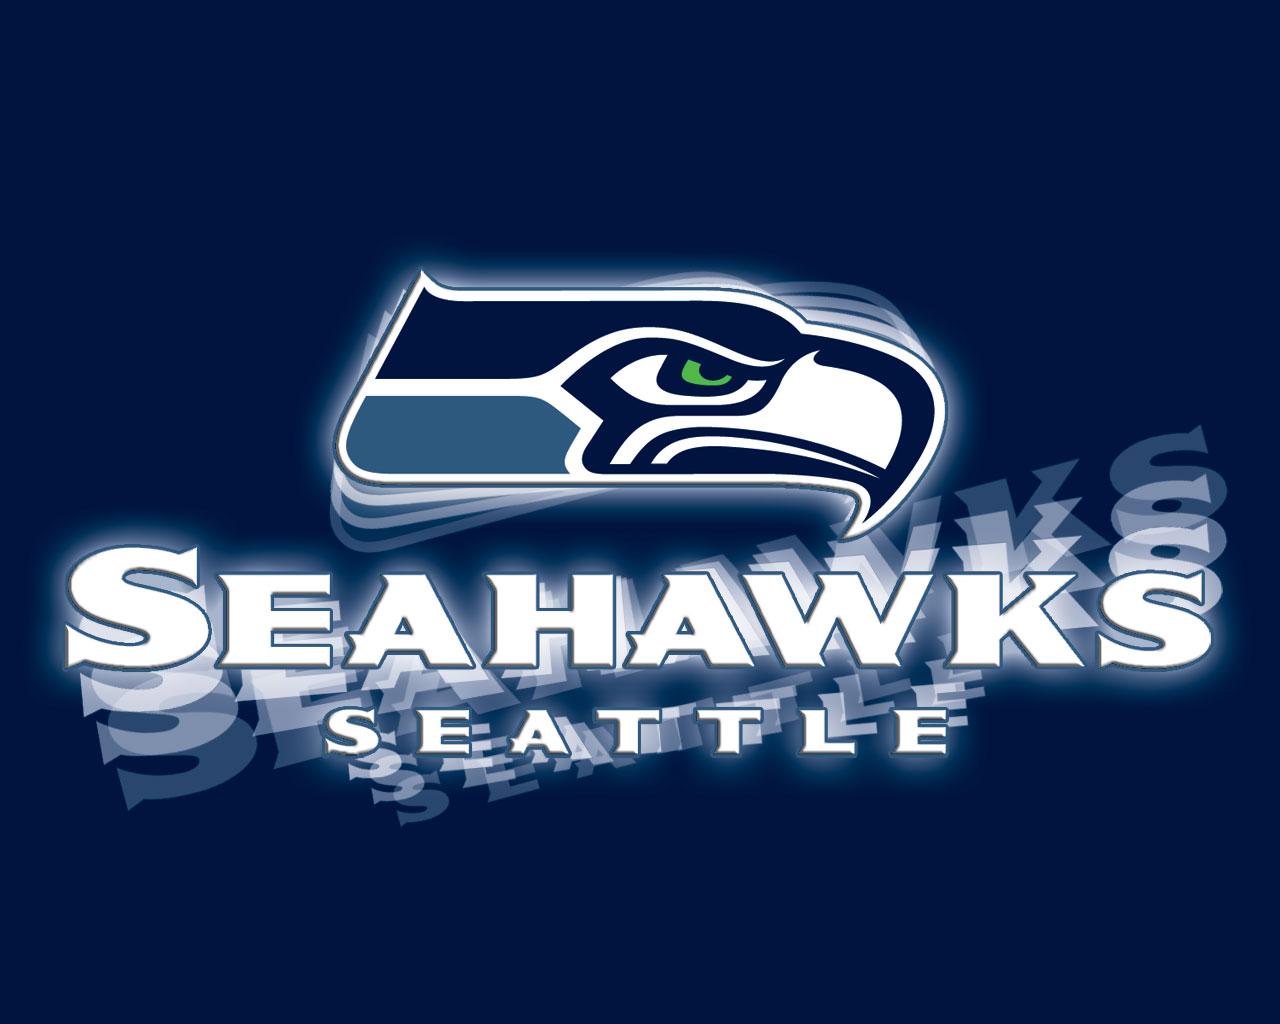 Seahawks   Wallpapers Pictures Pics Photos Images Desktop 1280x1024